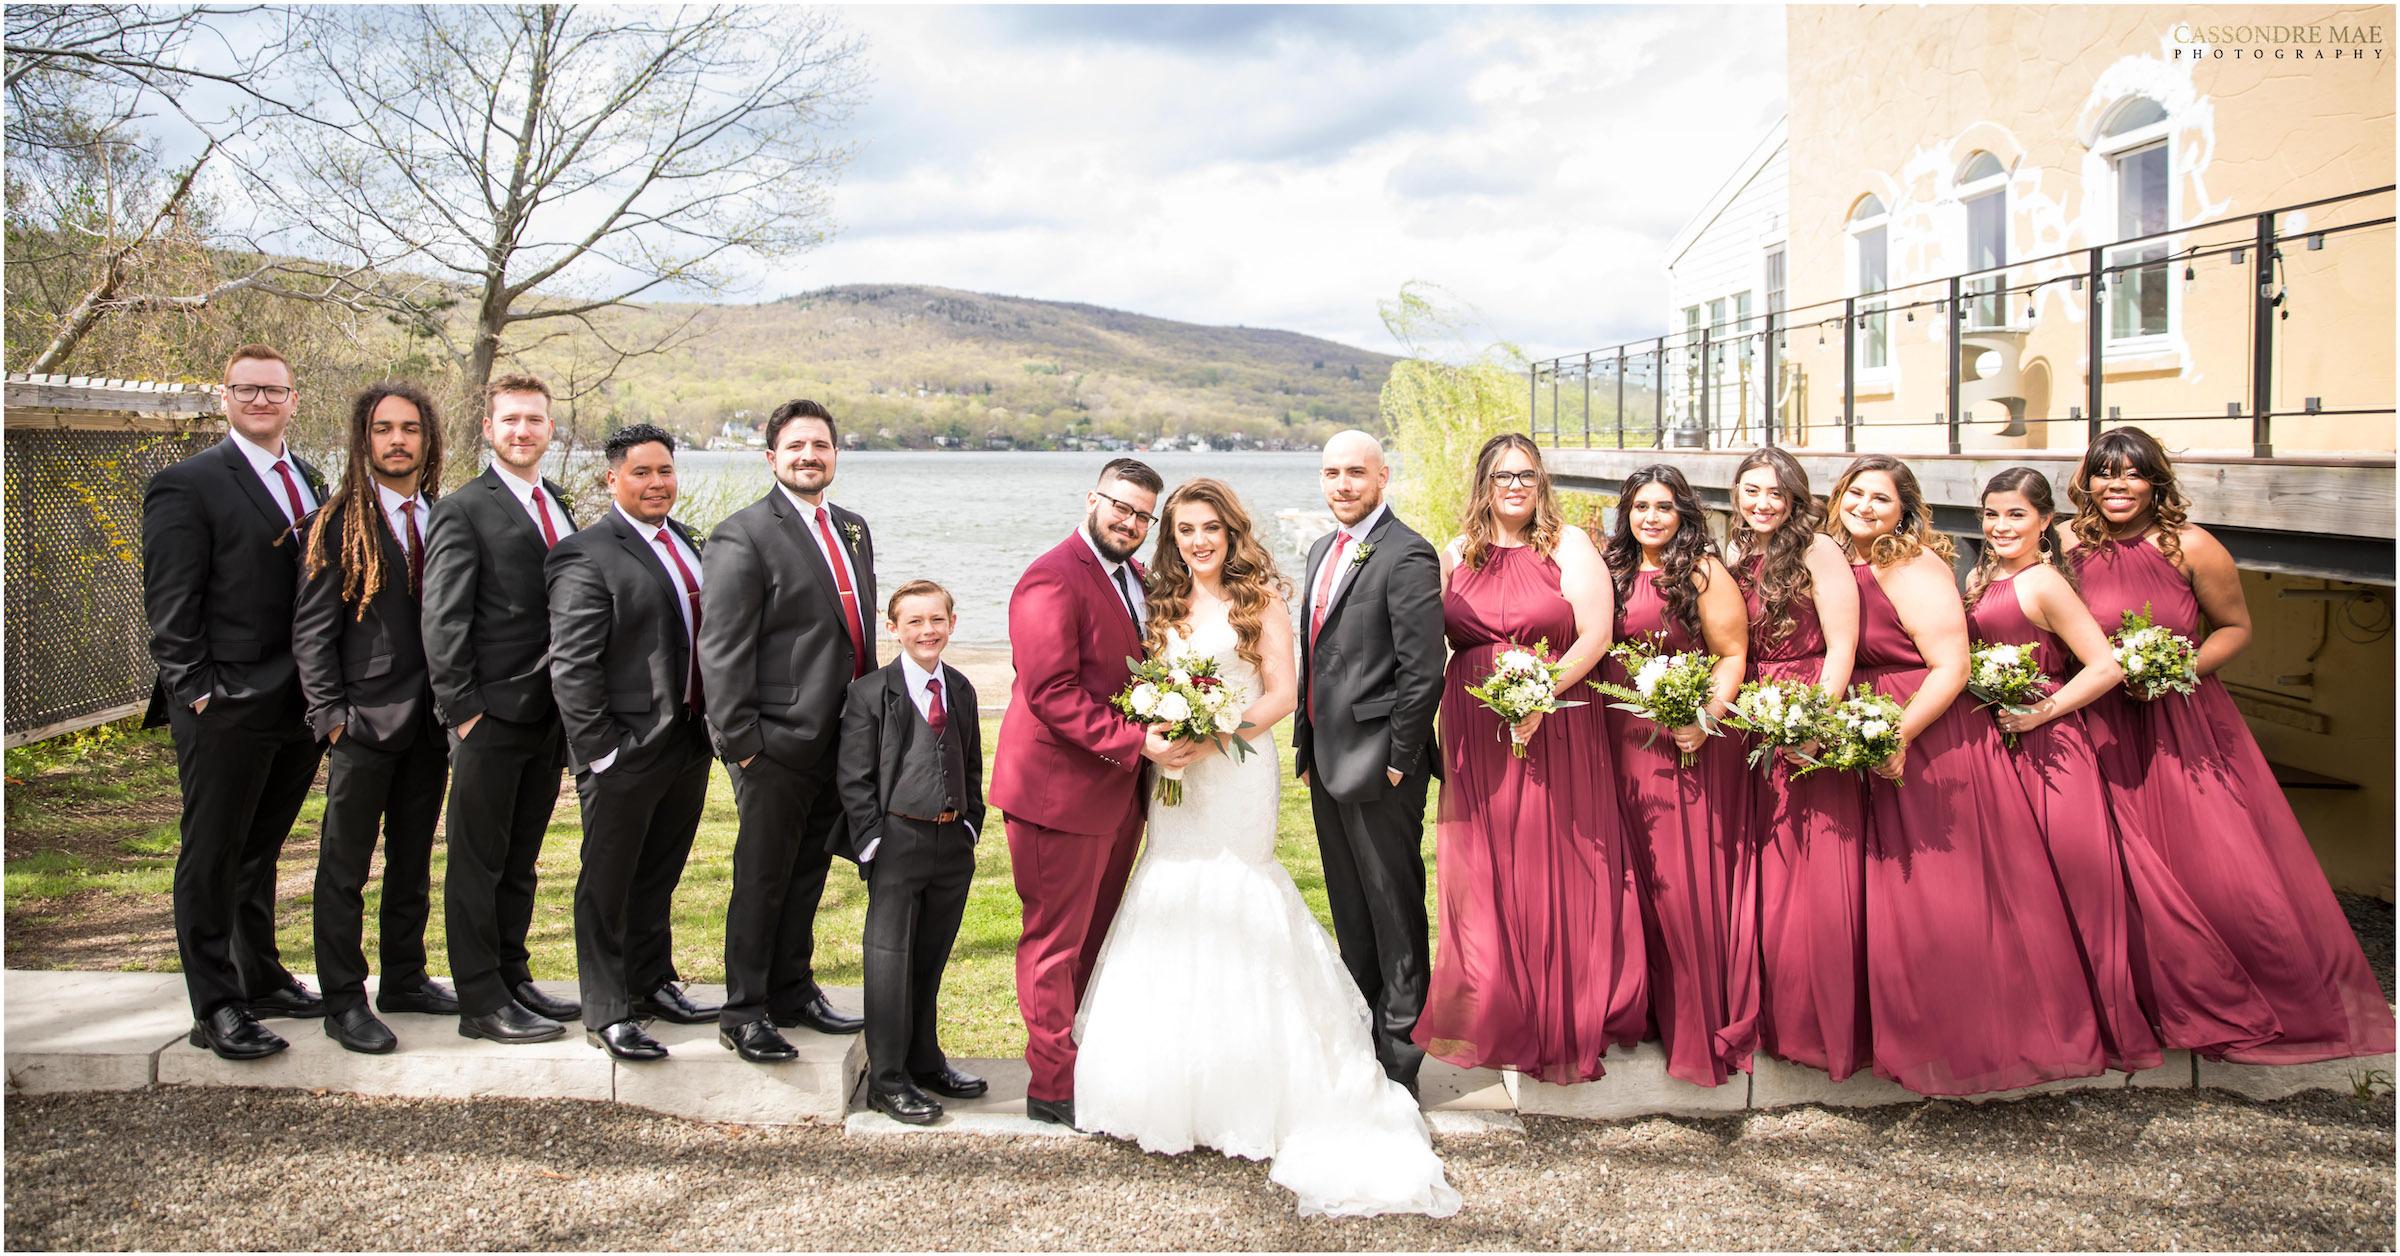 Cassondre Mae Photography Cove Castle Weddings 23.jpg